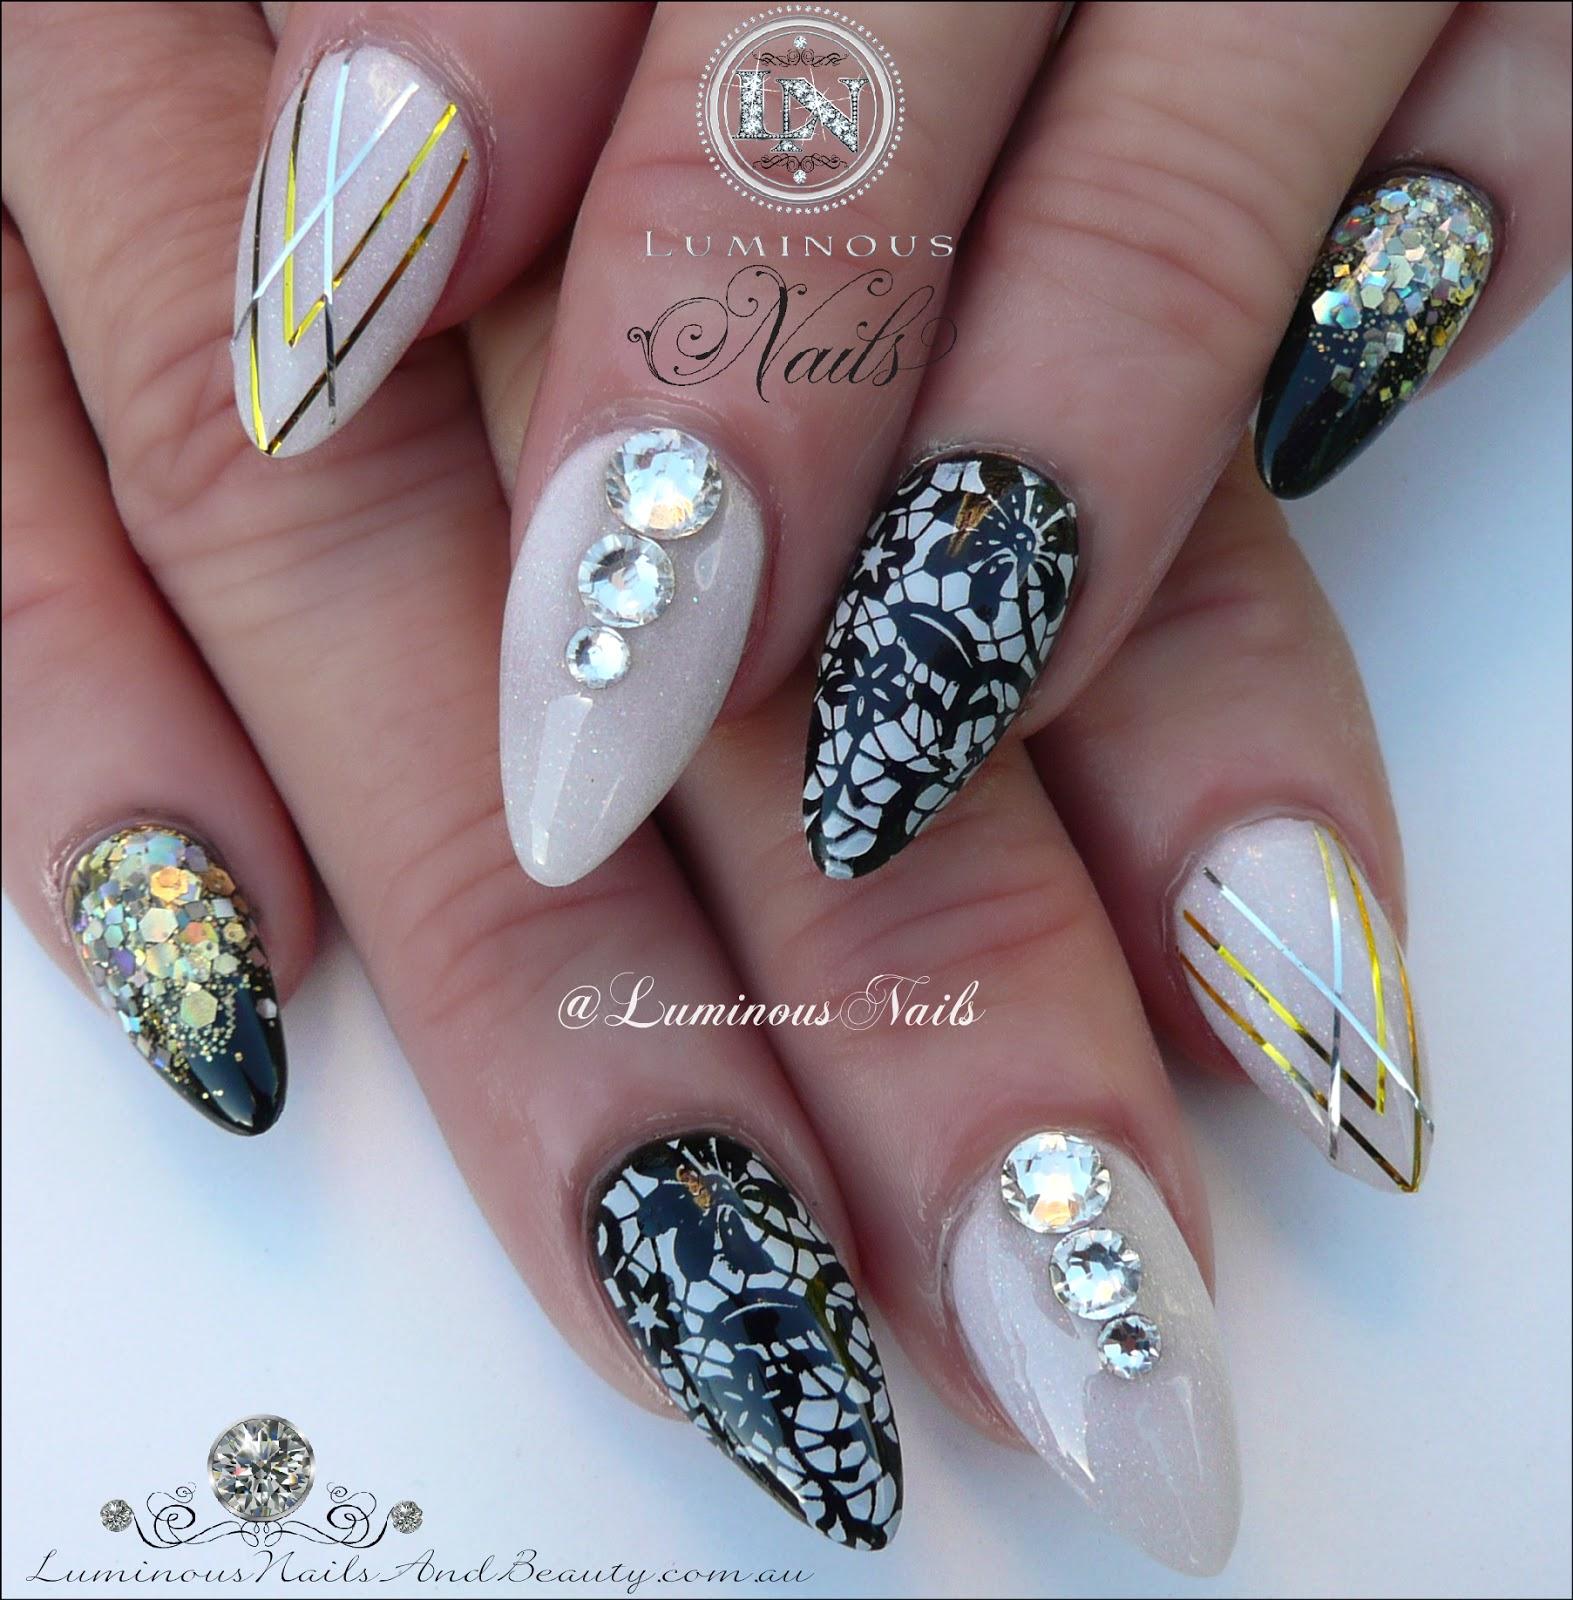 Luminous Nails Black White Gold Acrylic Nails